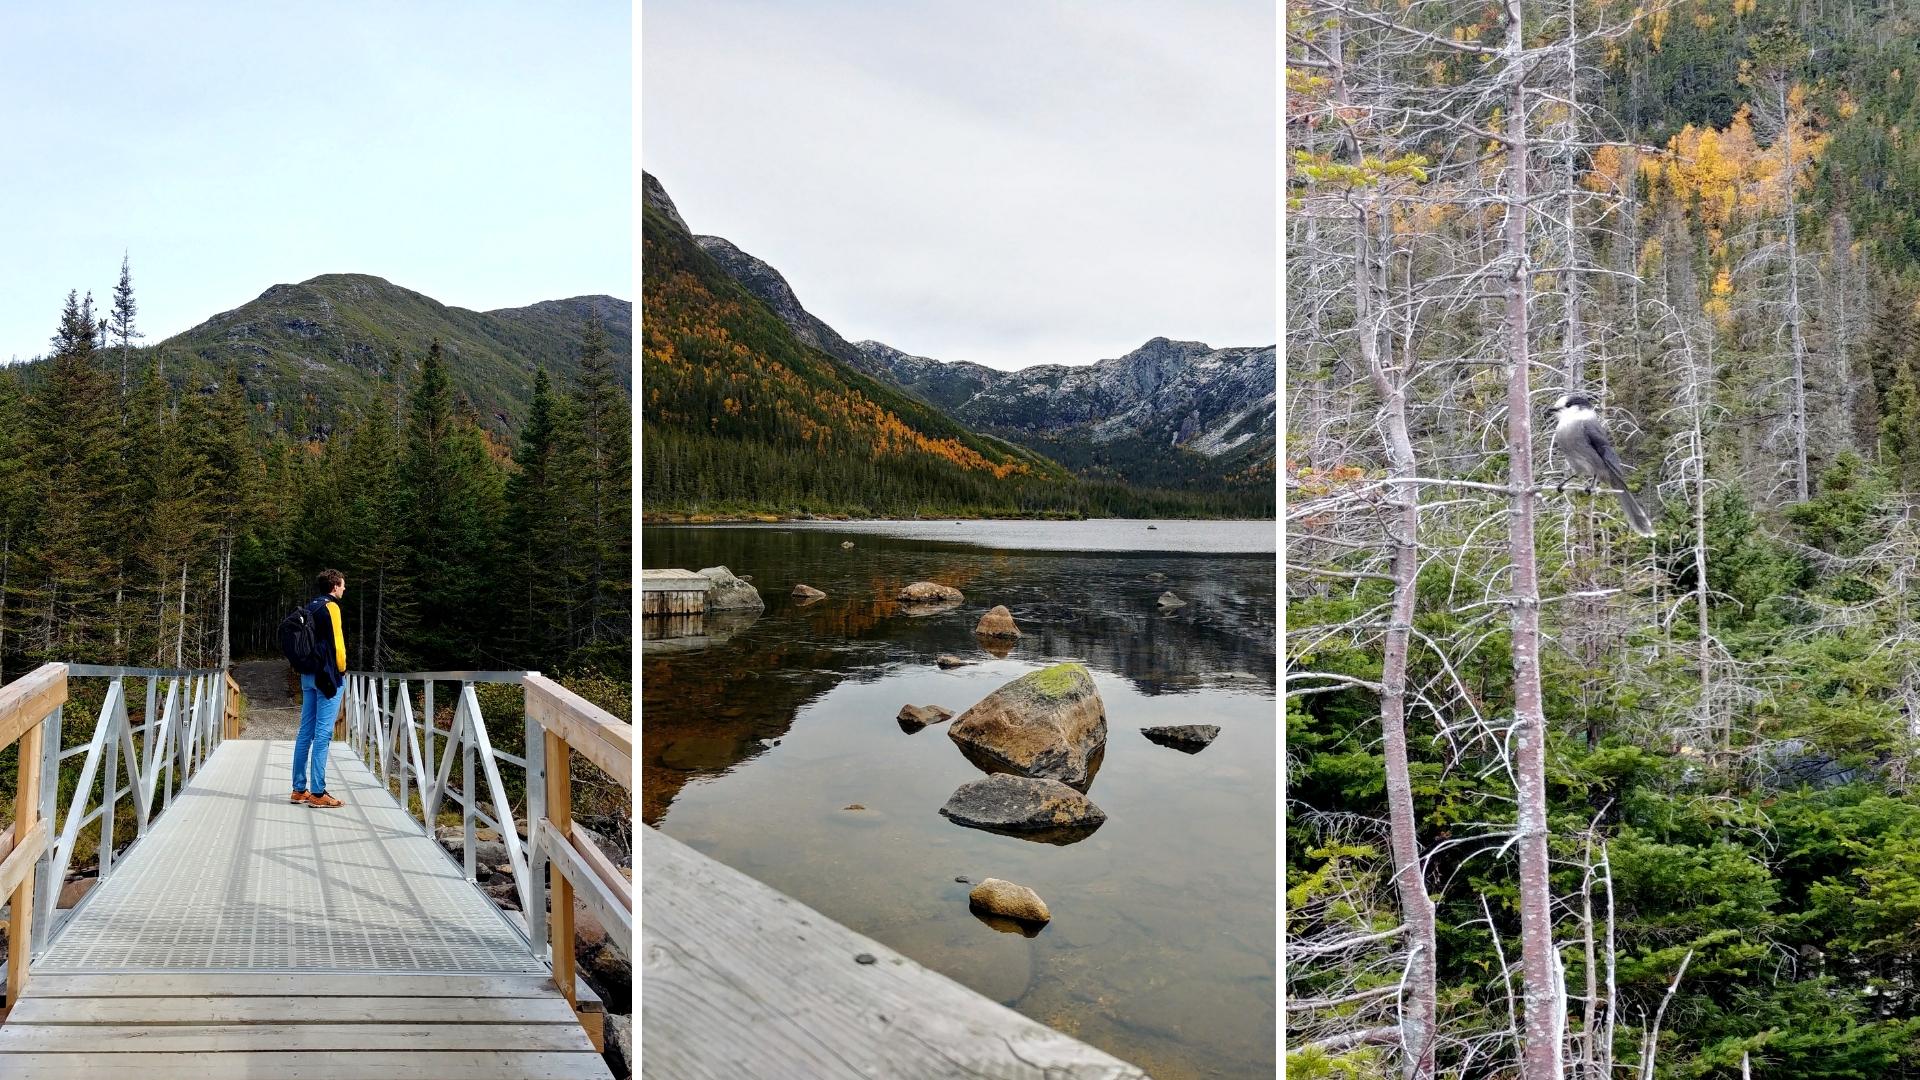 lac aux americains randonnee gaspesie automne blog voyage canada road-trip arpenter le chemin